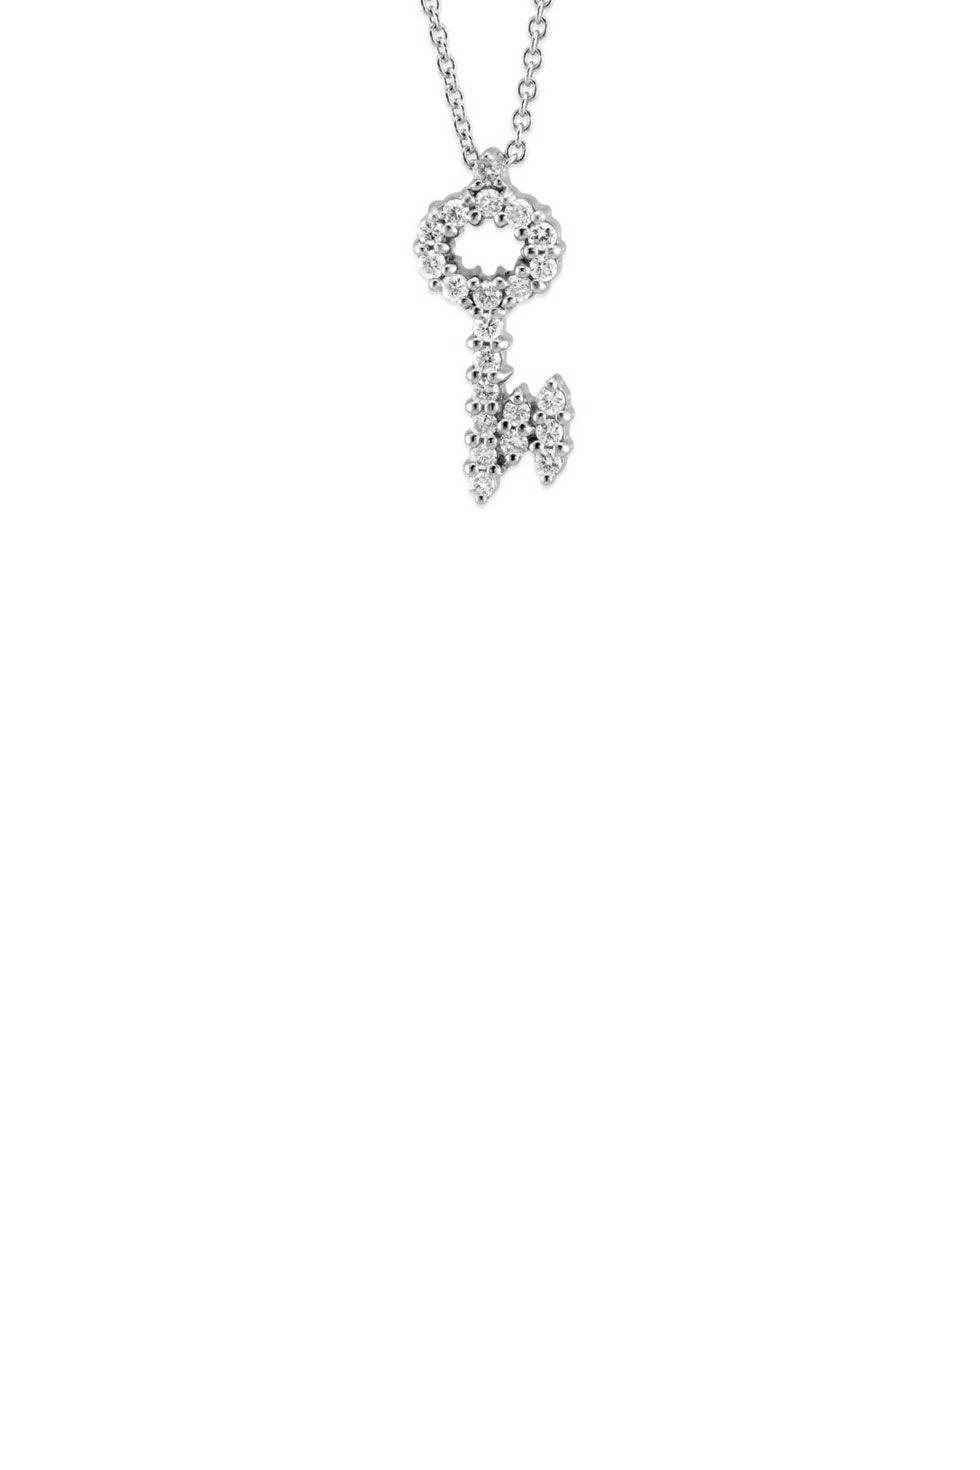 "<p>Roberto Coin Tiny Treasures Diamond Key Pendant Necklace, $780; <a href=""http://jrdunn.com/roberto-coin-tiny-treasures-diamond-key-necklace.html?gclid=CjwKEAiAhPCyBRCtwMDS5tzT03gSJADZ8VjRfrlqXQ1slNE_mbz0yId0srWrrl4O3lVzqqwwD5nNAhoCIXXw_wcB#.Vlx-eWSrSys"">jrdunn.com</a></p>"